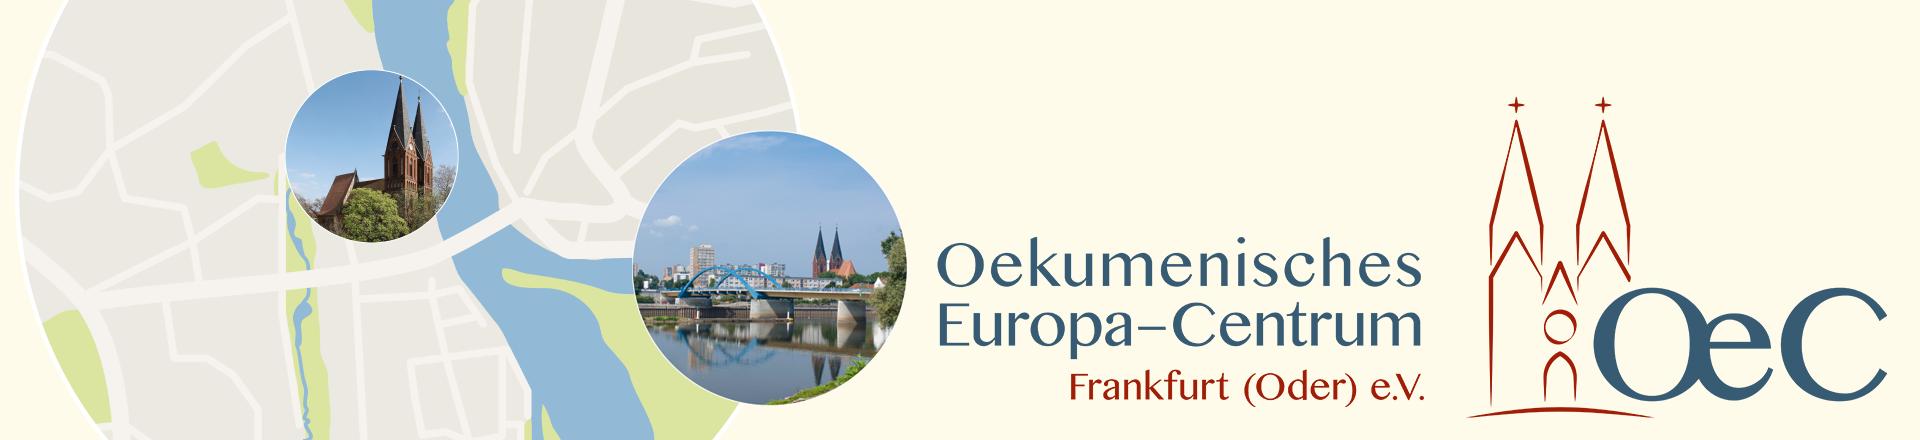 Oekumenisches Europa-Centrum Frankfurt (Oder) e.V.